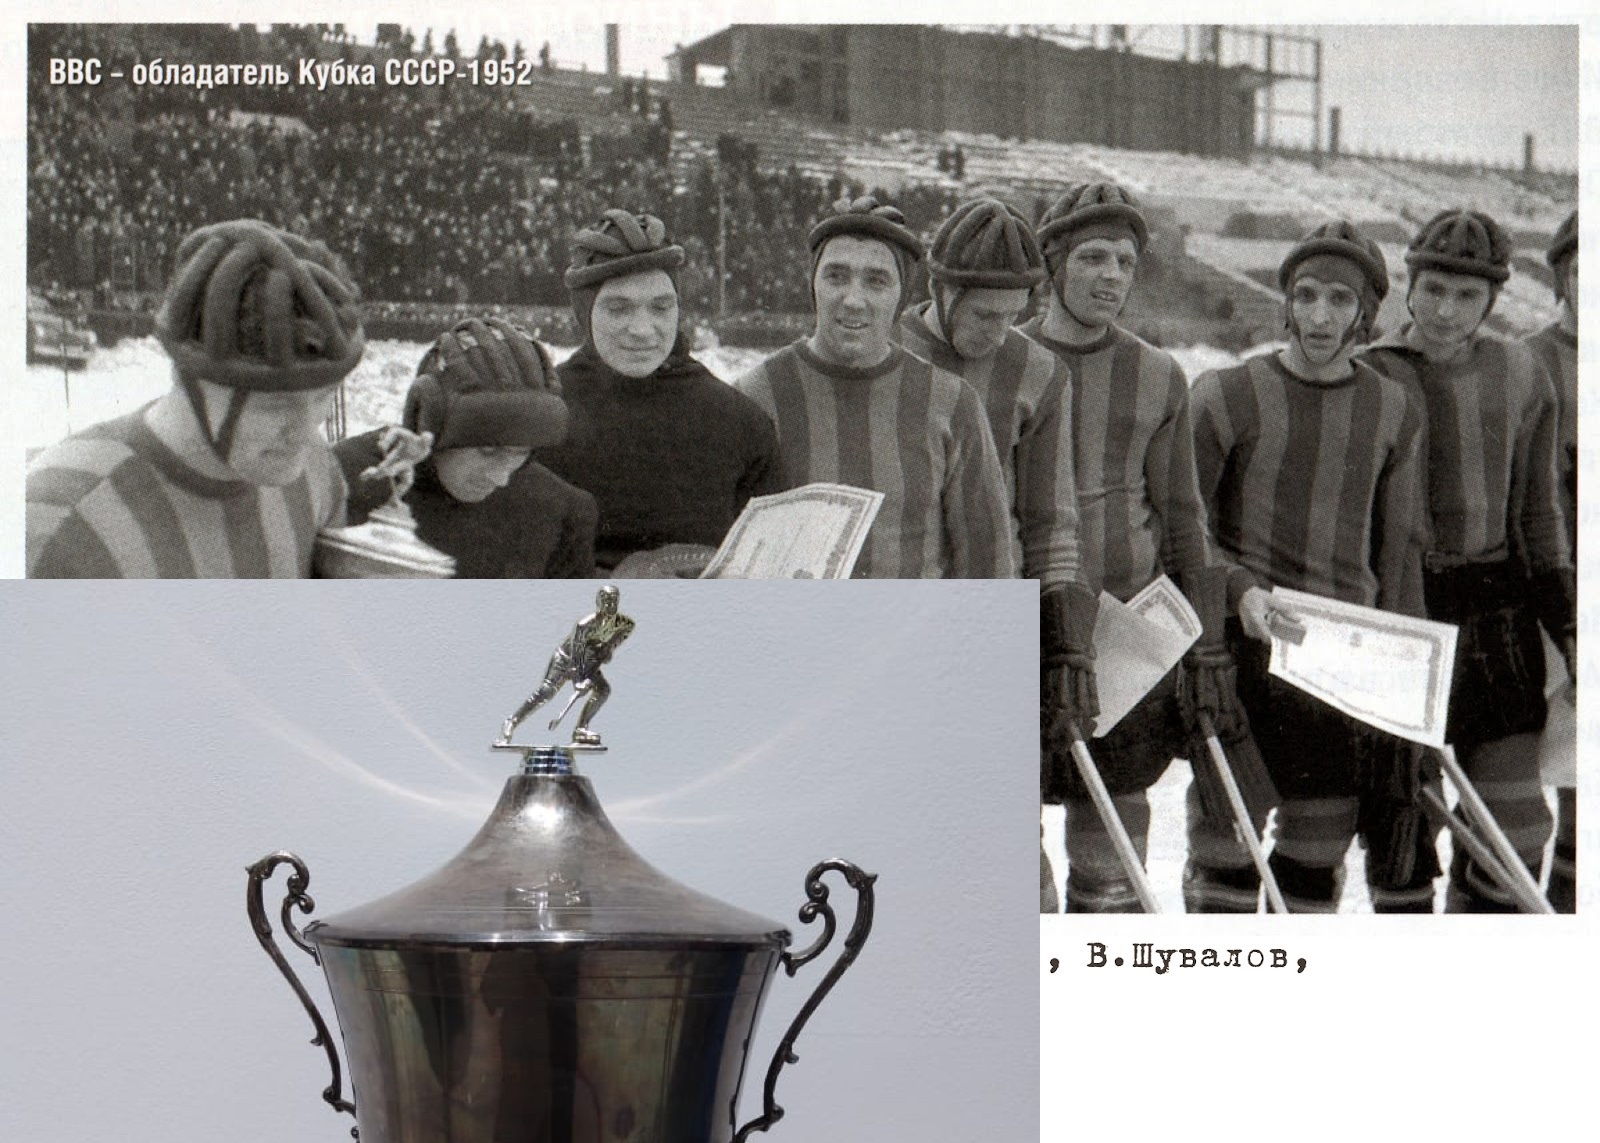 ВВС Обладатели Кубка СССР 1952 Шувалов.jpg